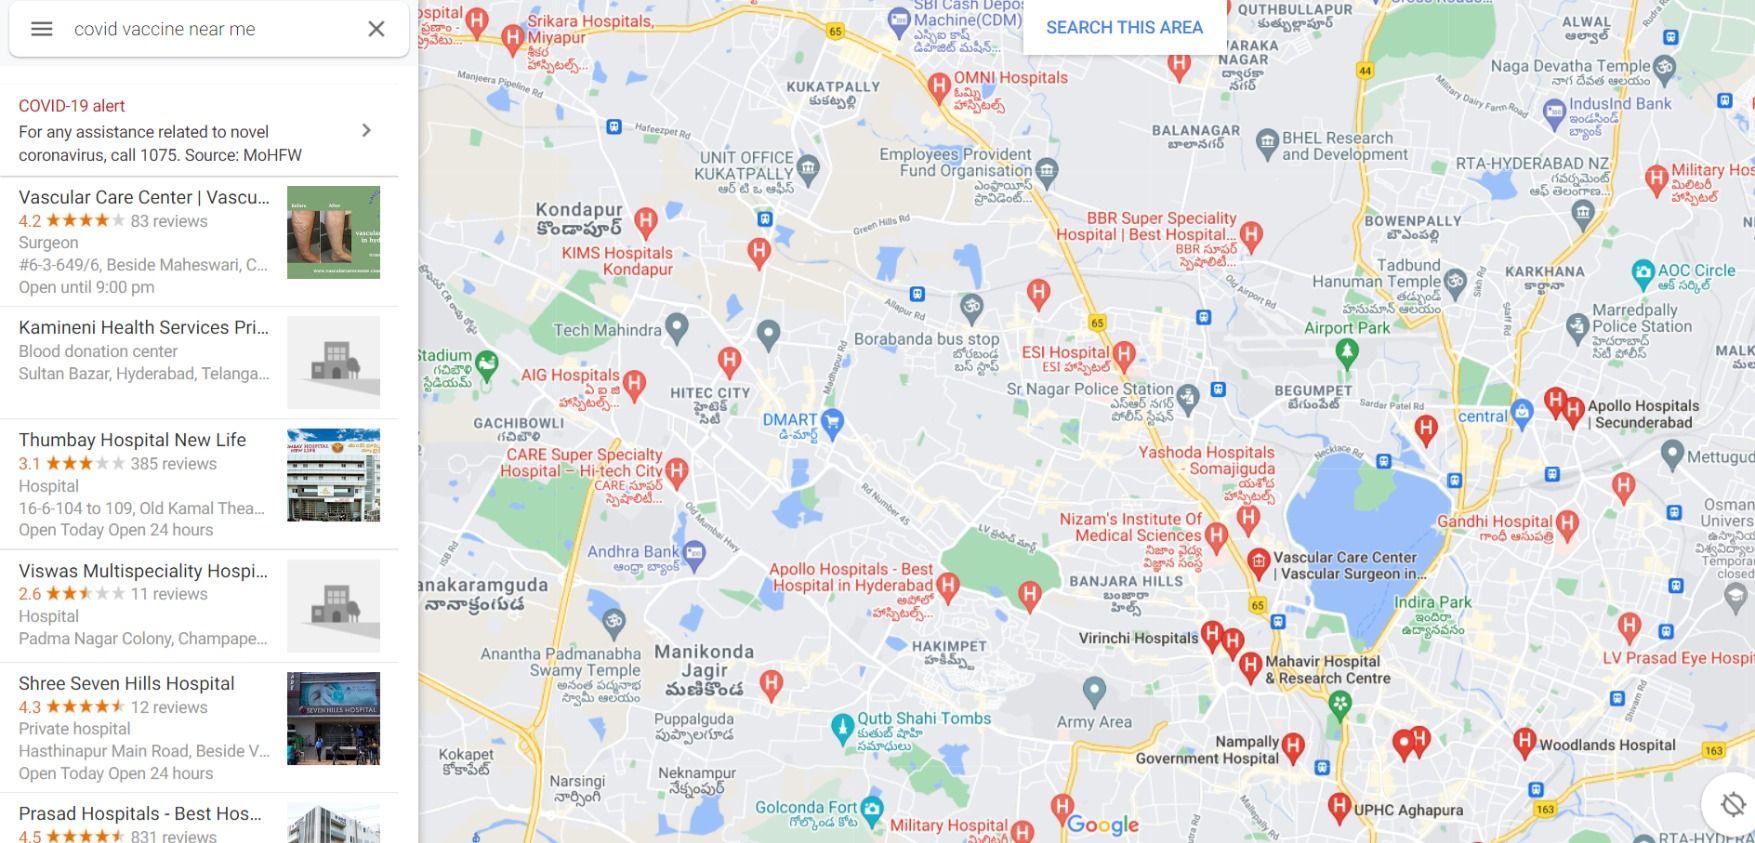 vaccine centre near me google maps